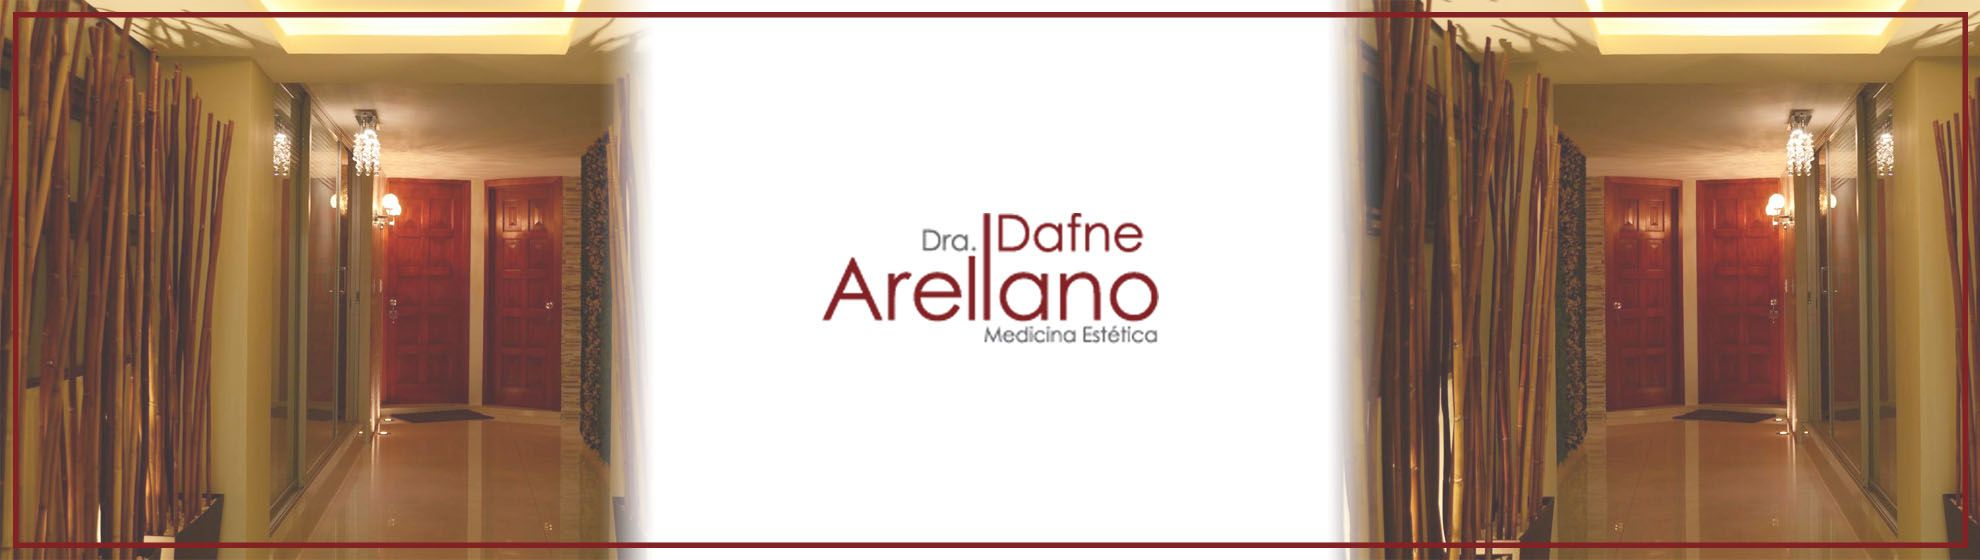 Dra. Dafne Arellano Montalvo